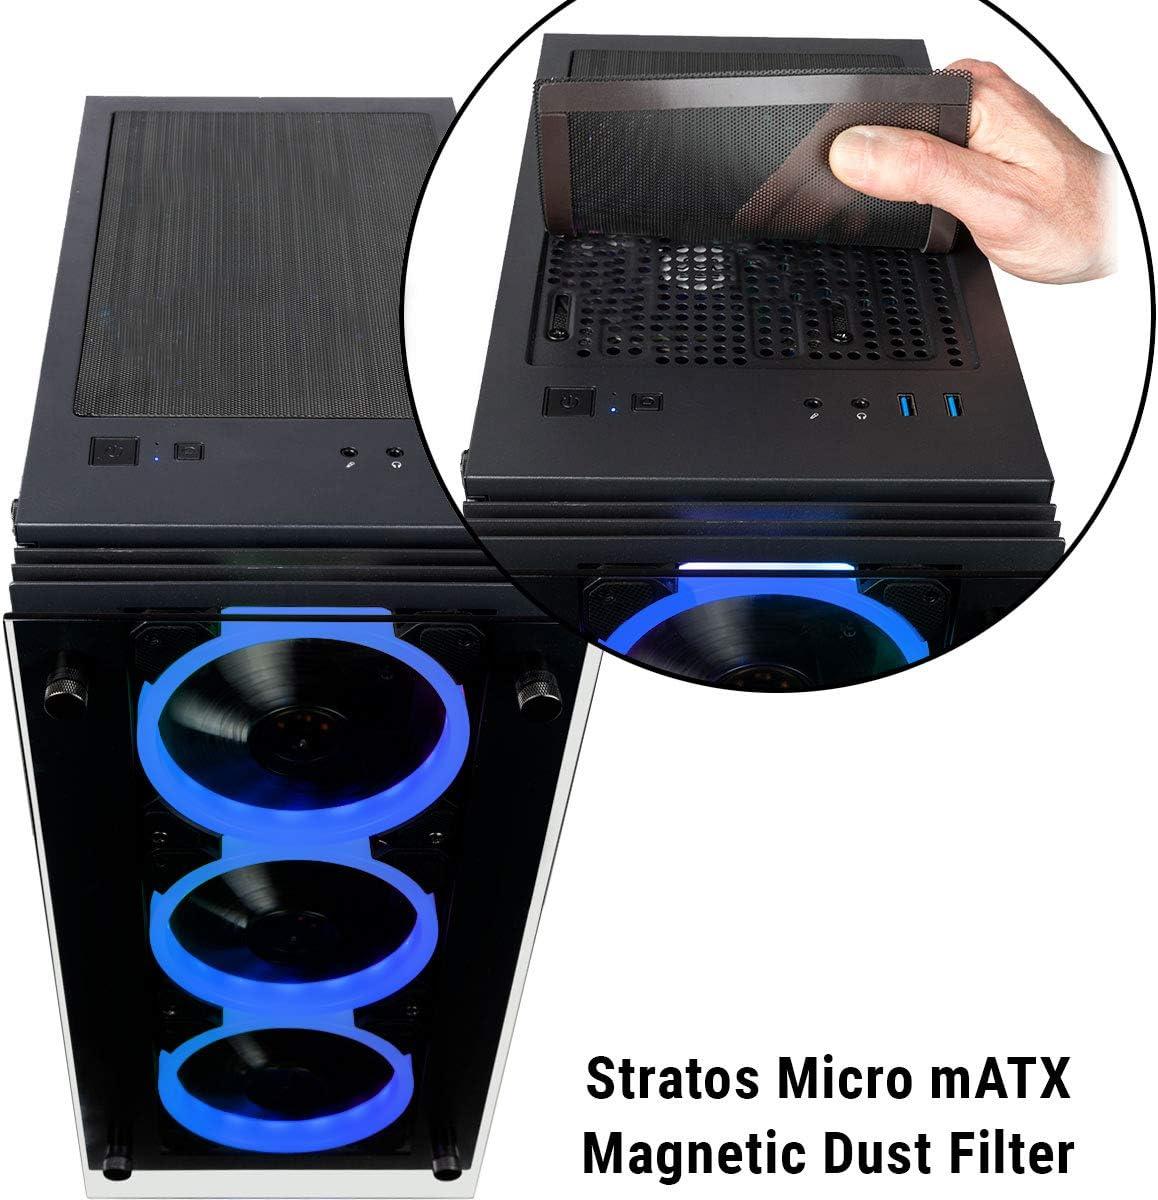 CUK Stratos Micro Business Desktop Intel i7-9700K, 32GB DDR4 RAM, 512GB NVMe SSD 2TB HDD, NVIDIA GeForce GTX 1060 3GB, 500W Bronze PSU, AC WiFi, Windows 10 Pro Professional Desktop PC Computer